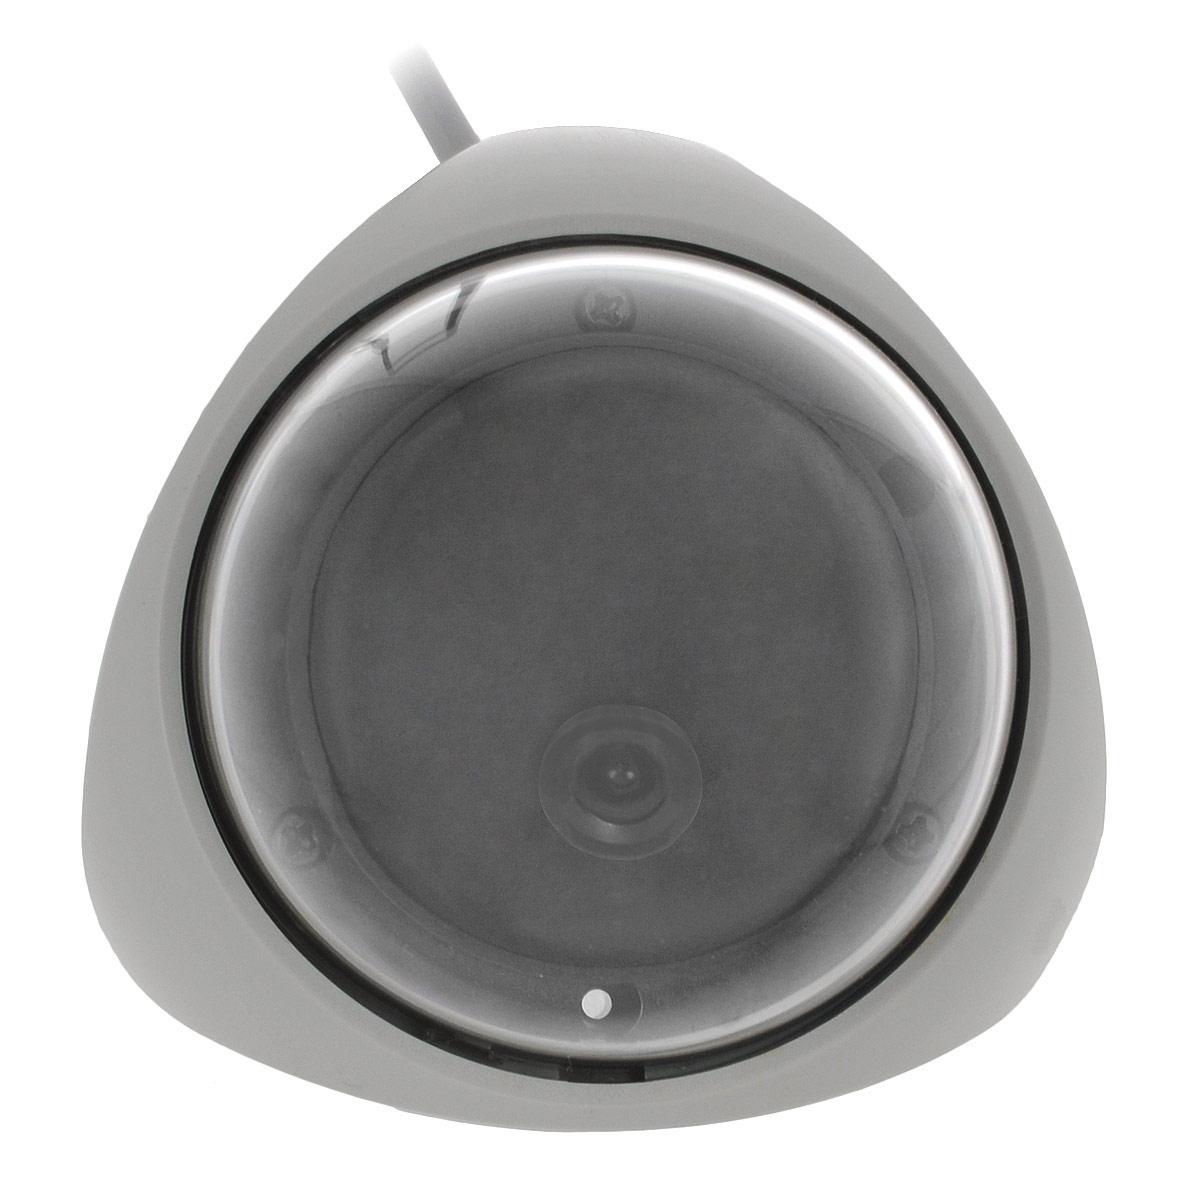 Sapsan SAV309A купольная видеокамера с микрофоном rechargeable 2 flat pin plug charger for 6v lead acid battery black red ac 100 240v